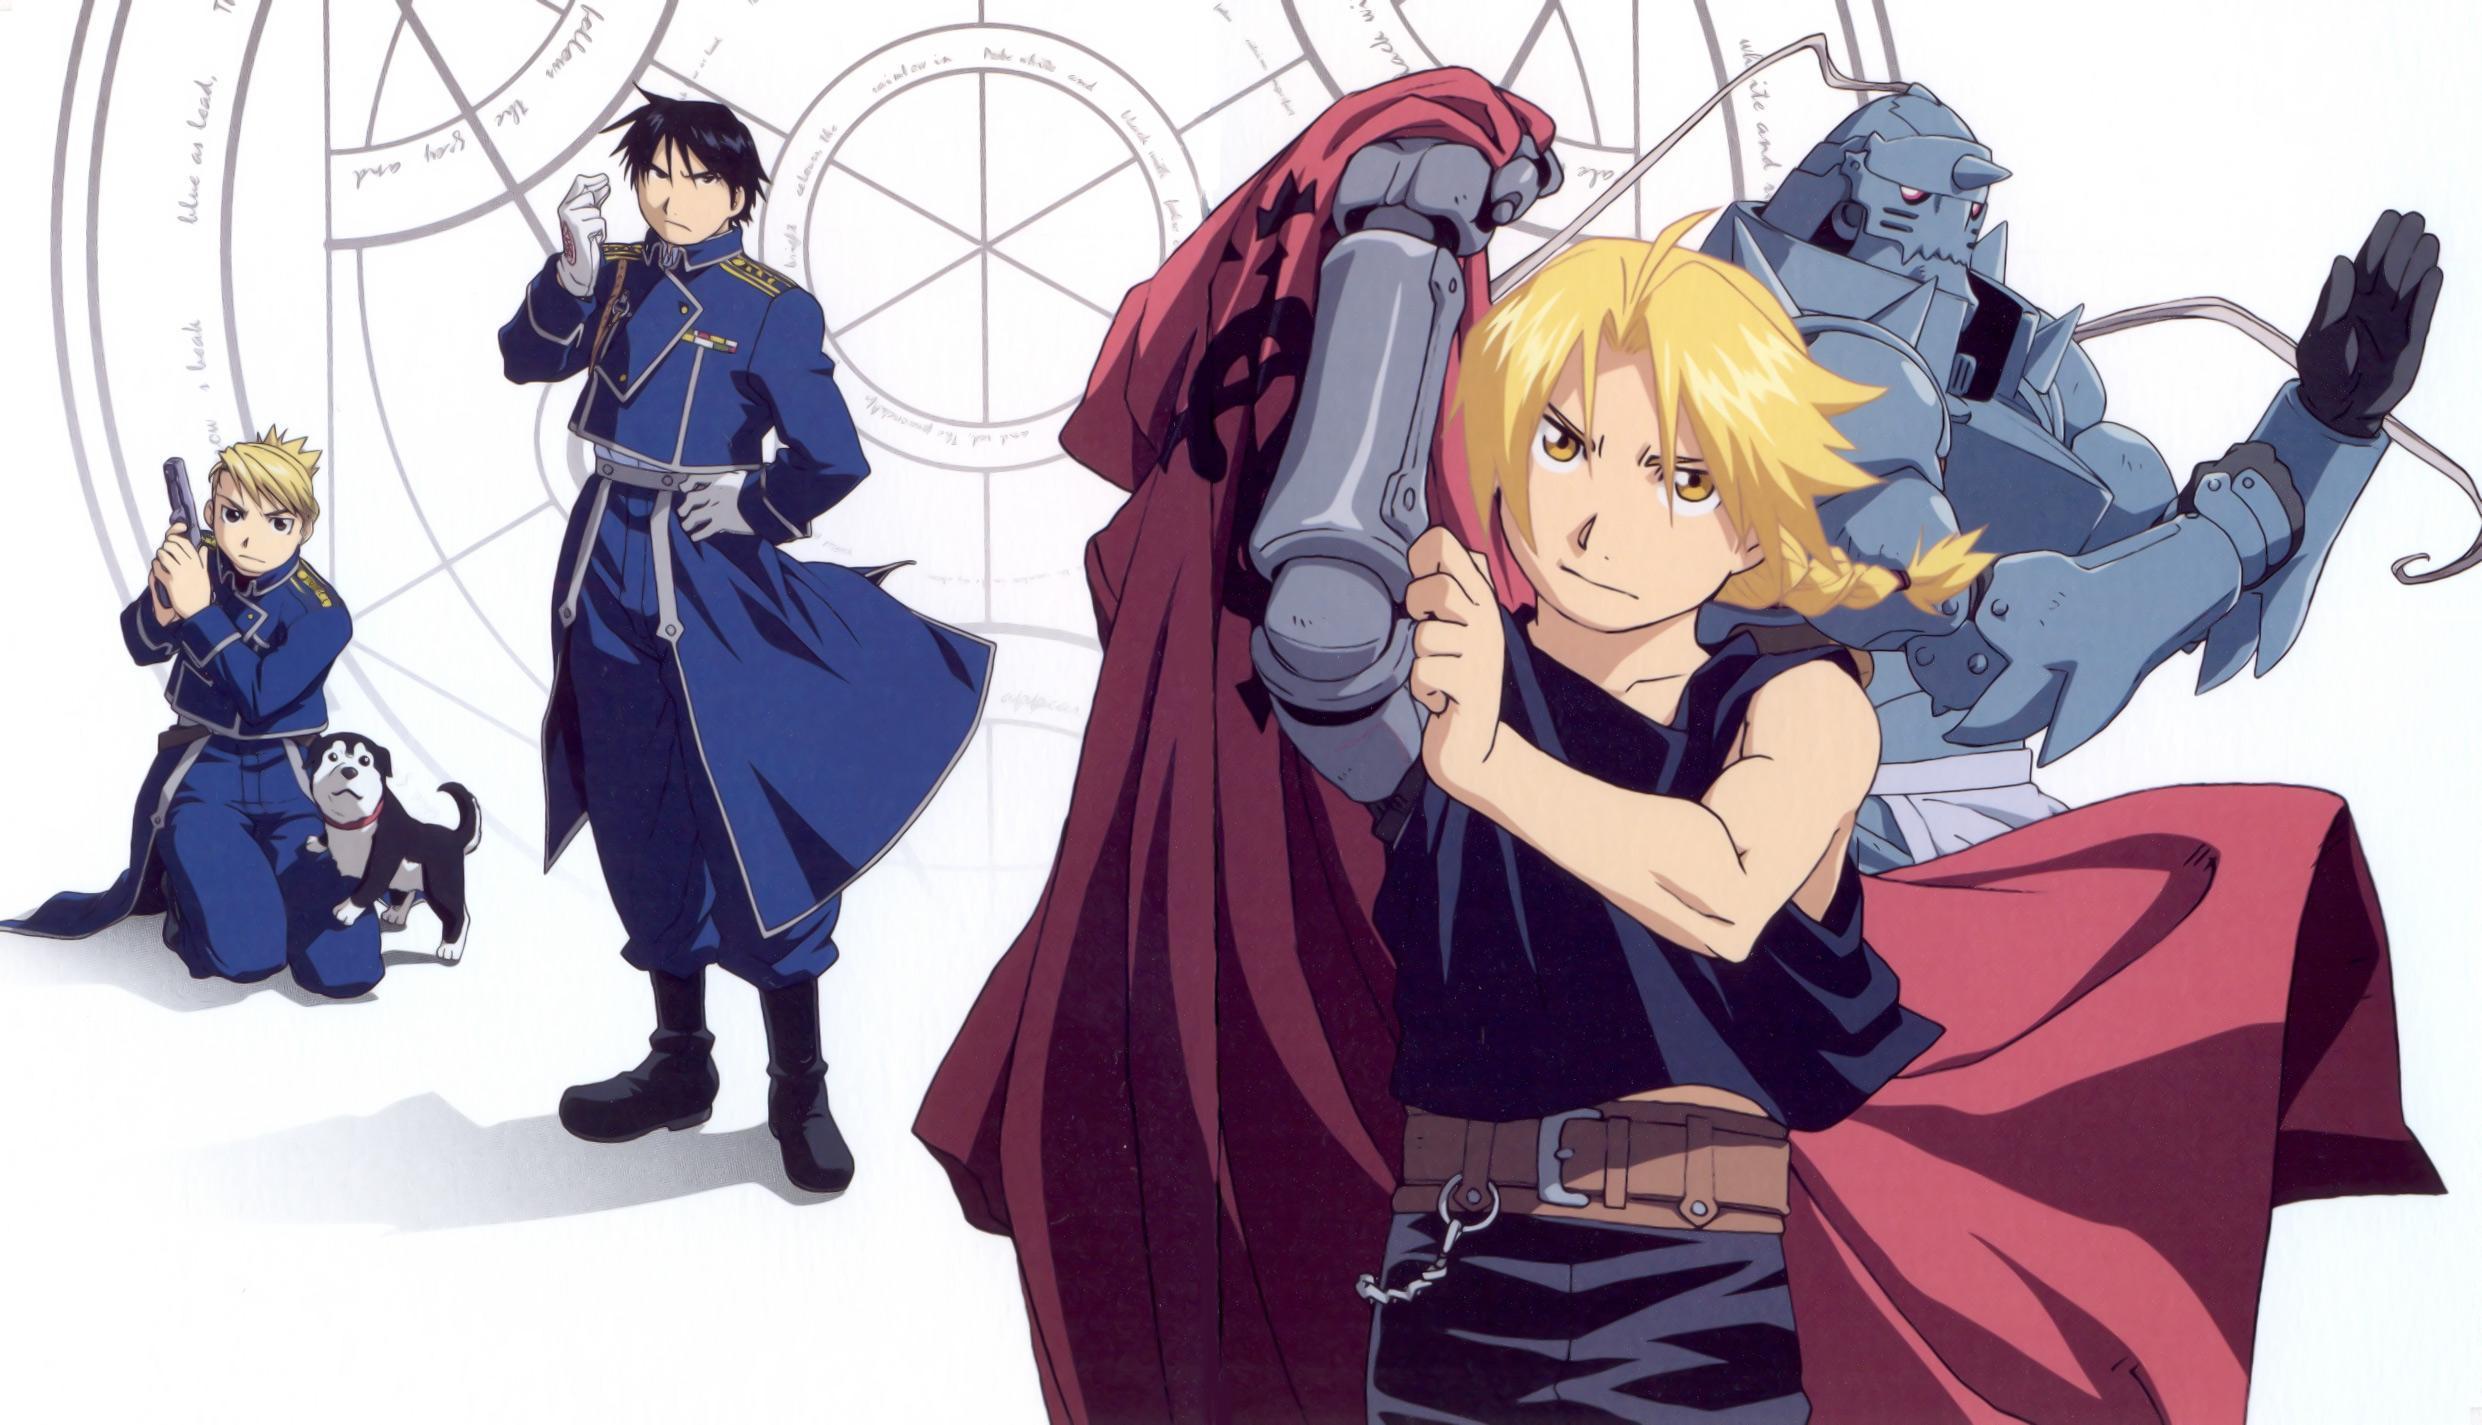 Fullmetal Alchemist: Brotherhood, Suspense Thriller anime